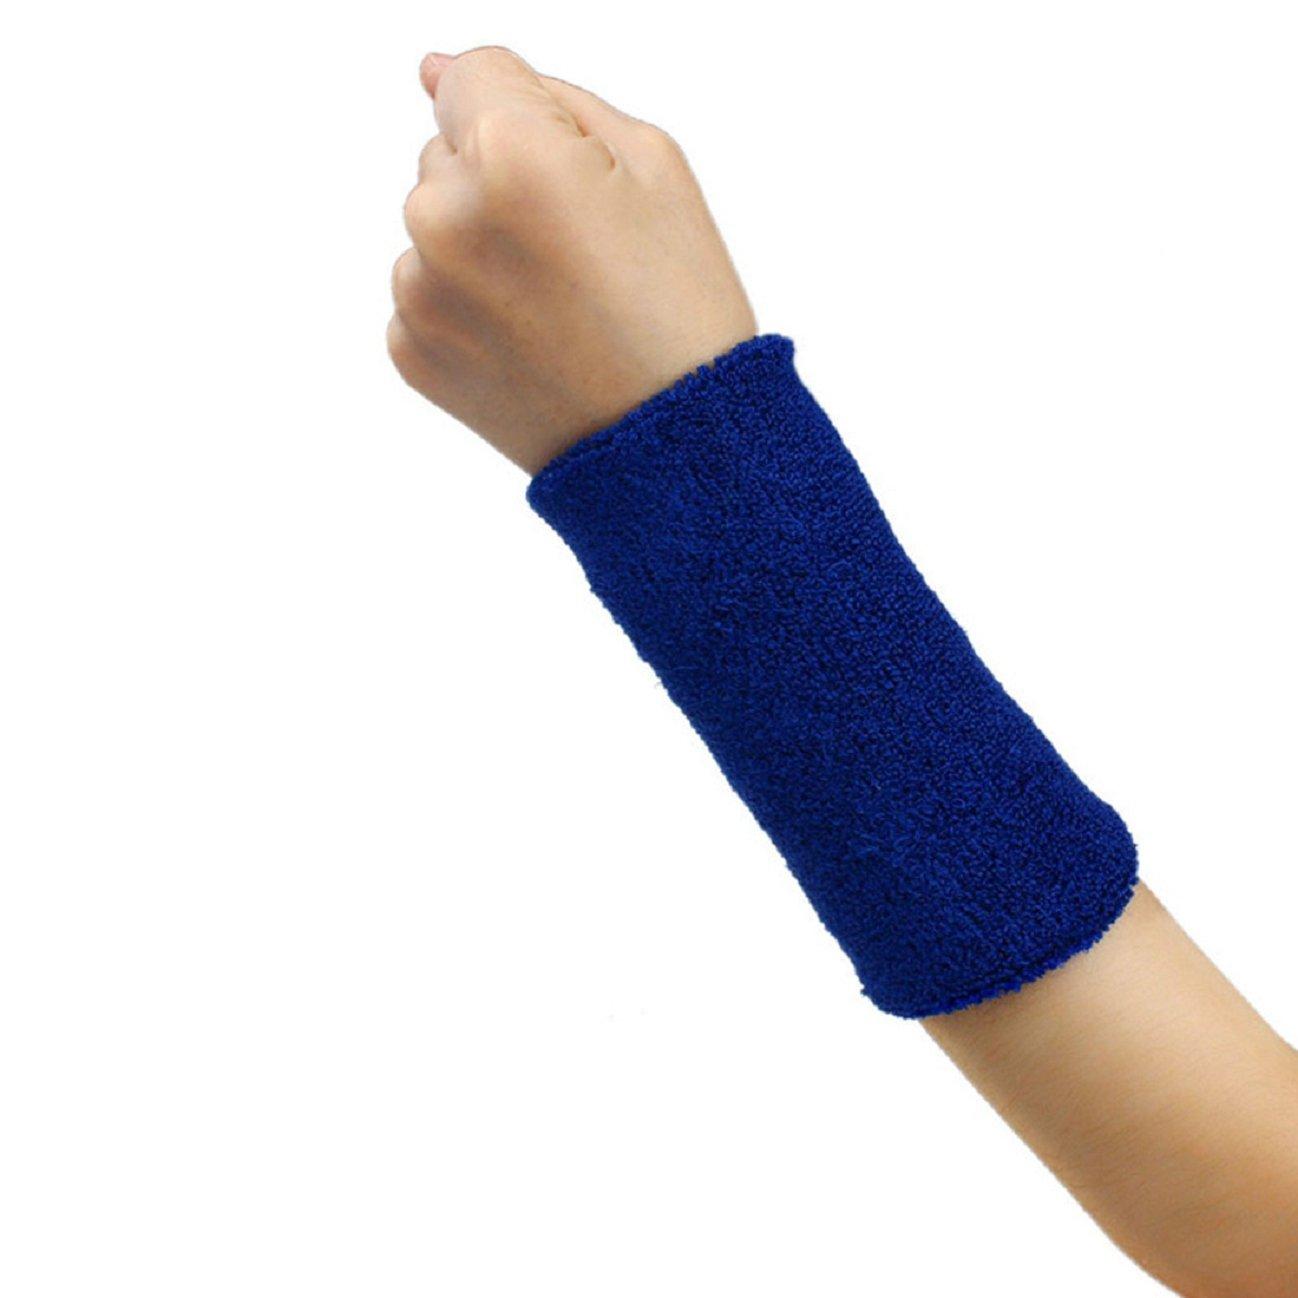 Tonsee 1 PCS Unisex Cotton Basketball Tennis Gym Yoga Sweatband Wristband (Blue)